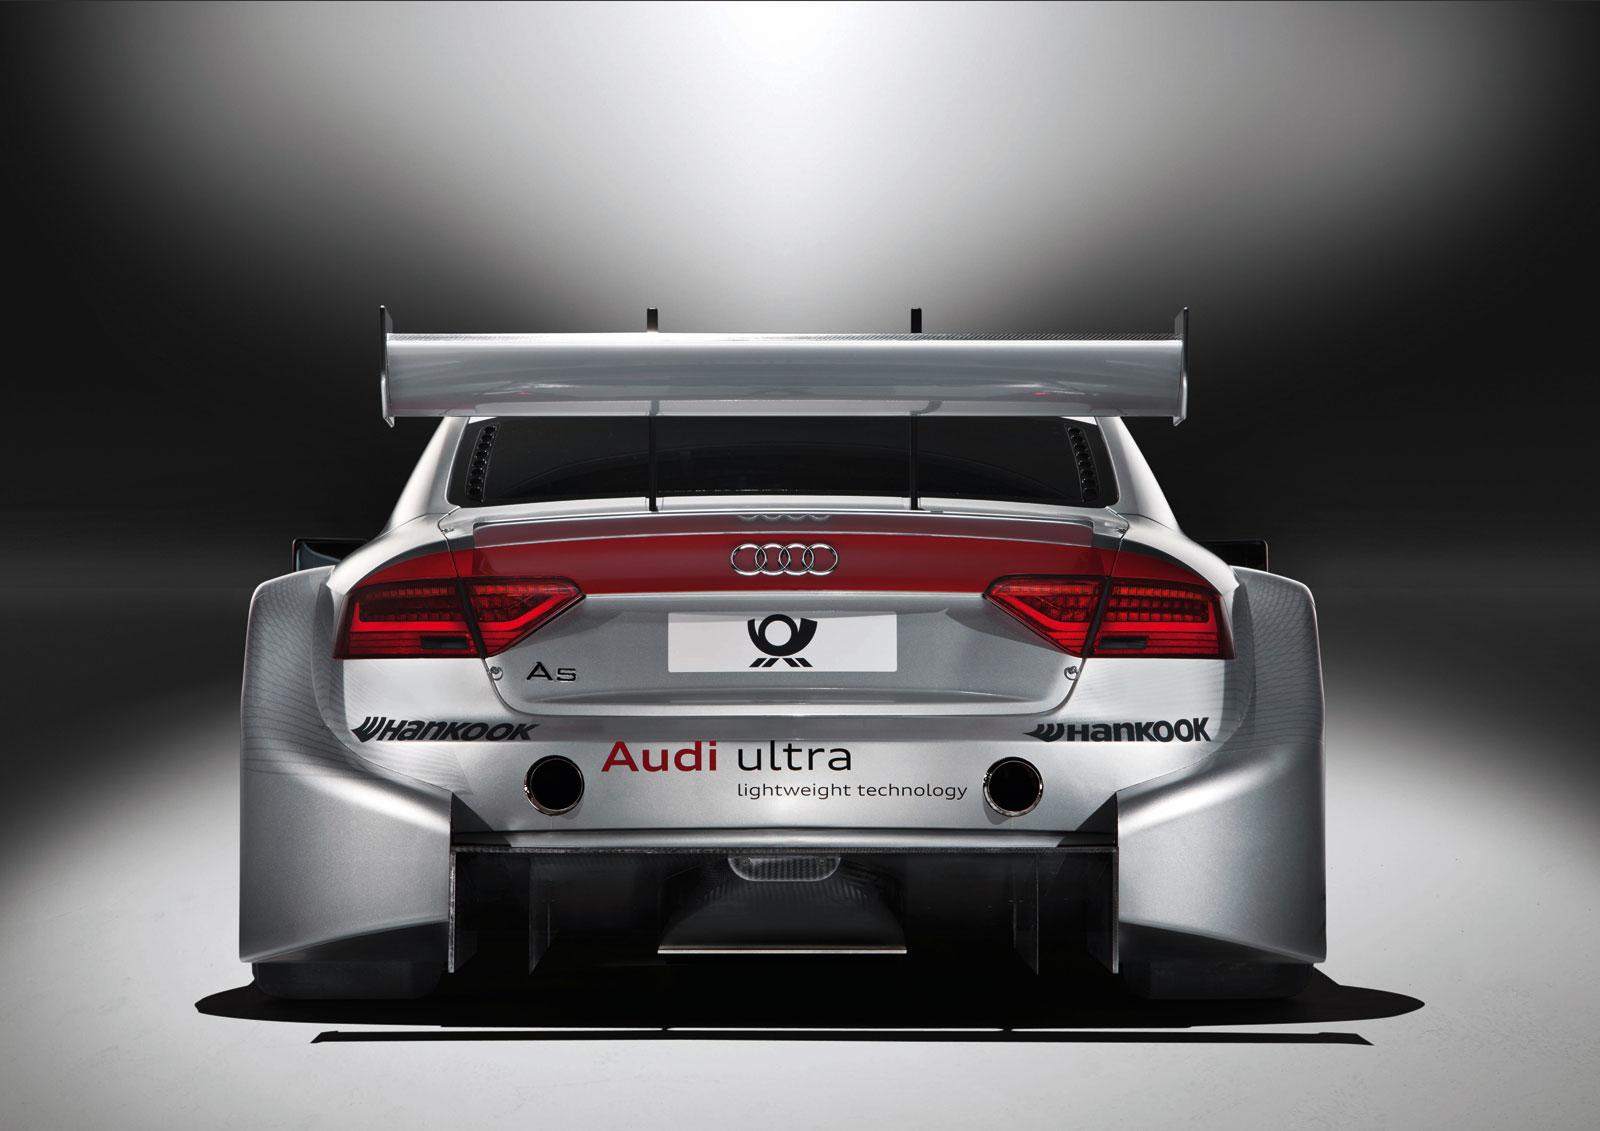 Sport Cars Audi A5 DTM Race Car hd Wallpapers 2012 1600x1131